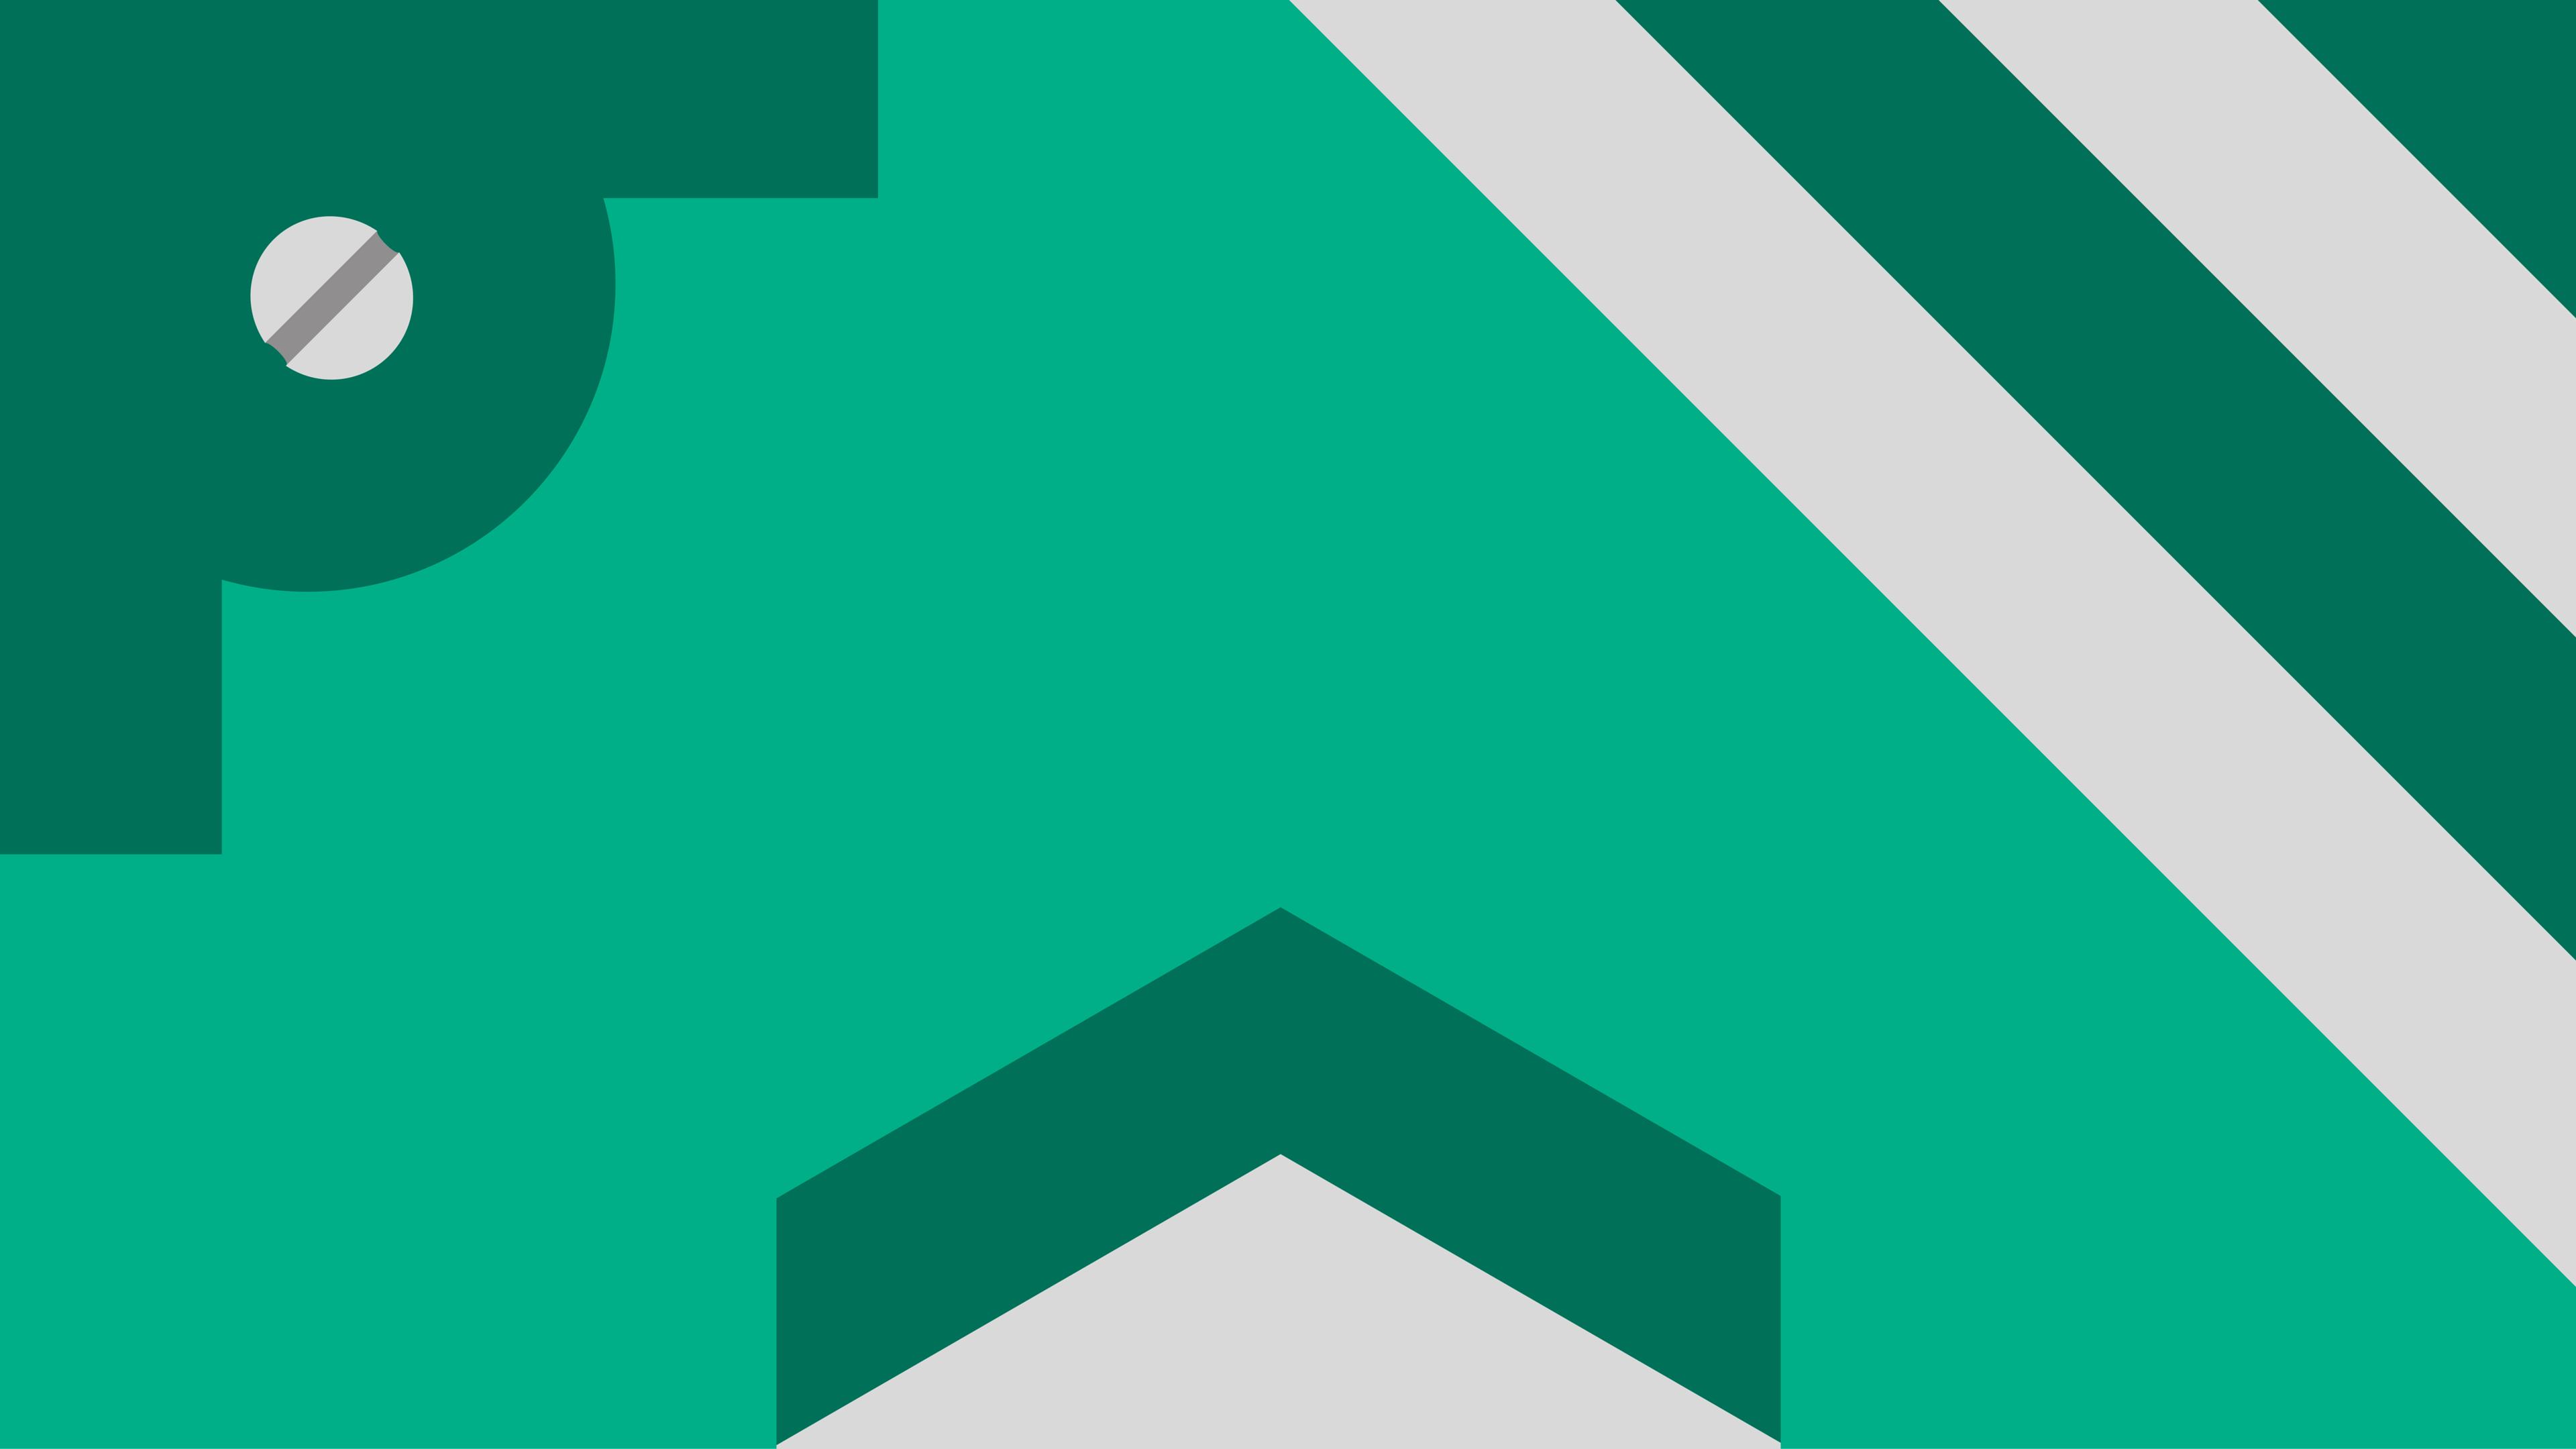 4k design wallpapers top free 4k design backgrounds for Material design wallpaper 4k